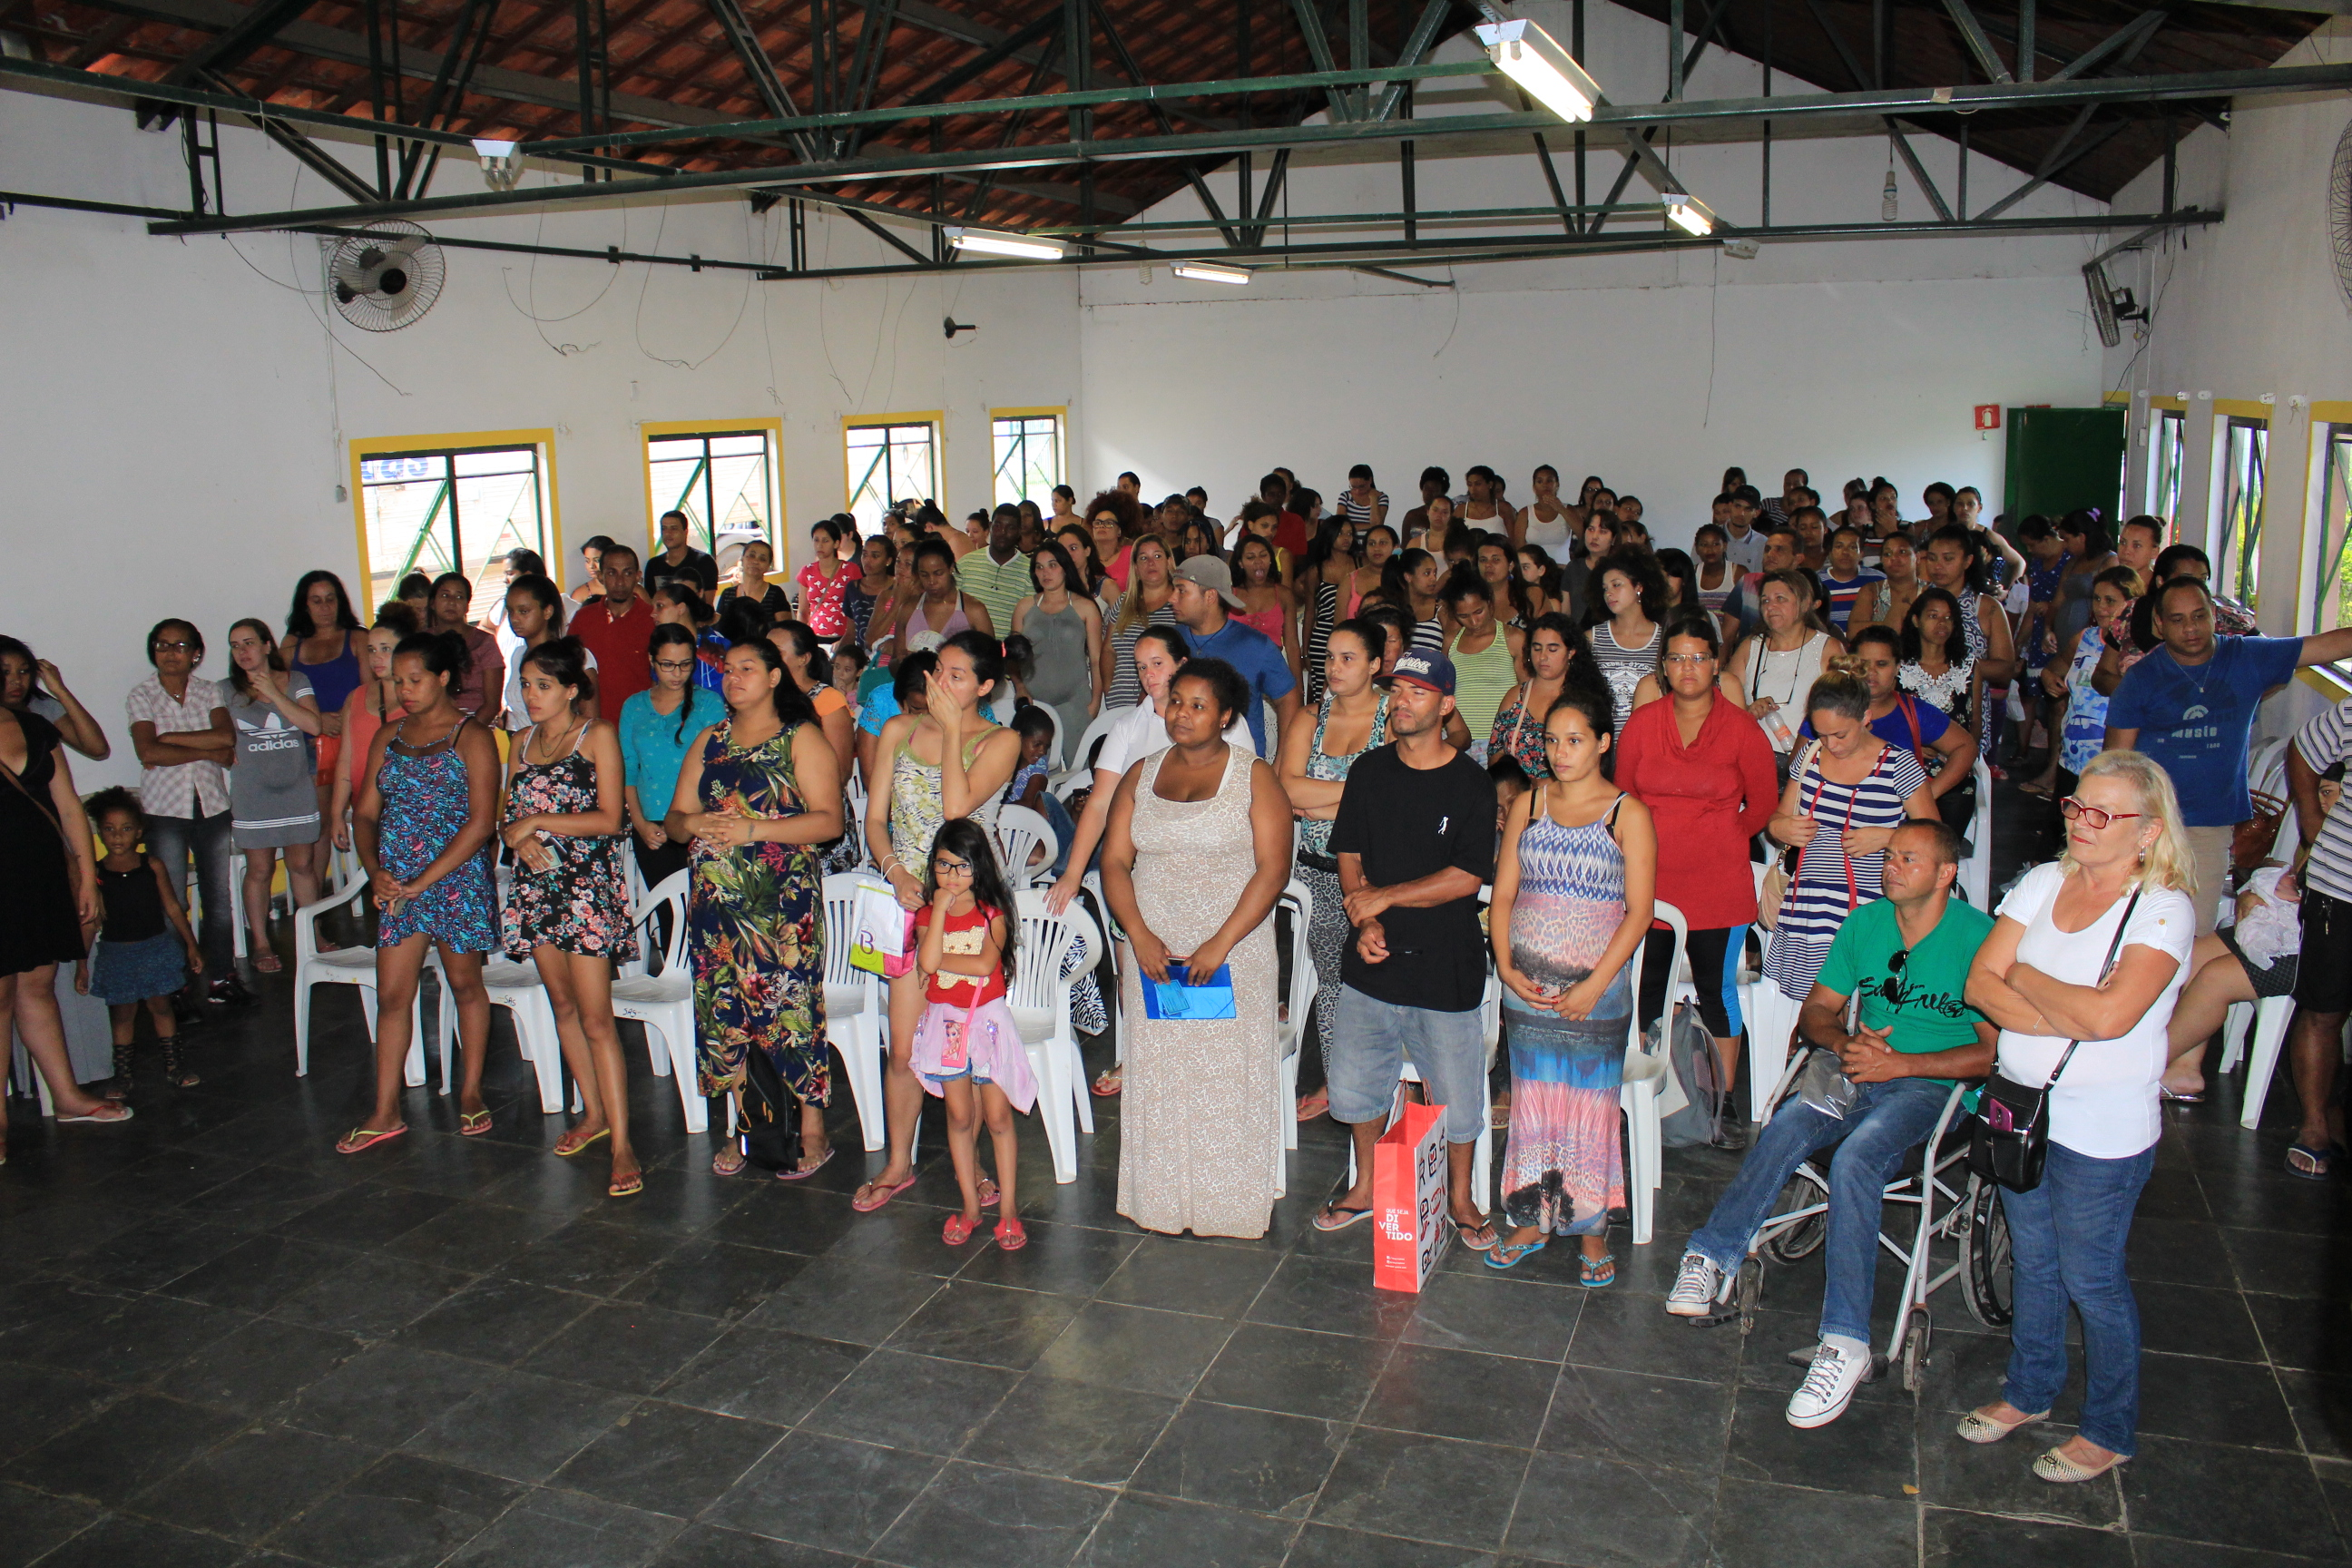 O Fundo Social de Solidariedade de Embu das Artes distribuiu na tarde de  14 12 26815fe88b